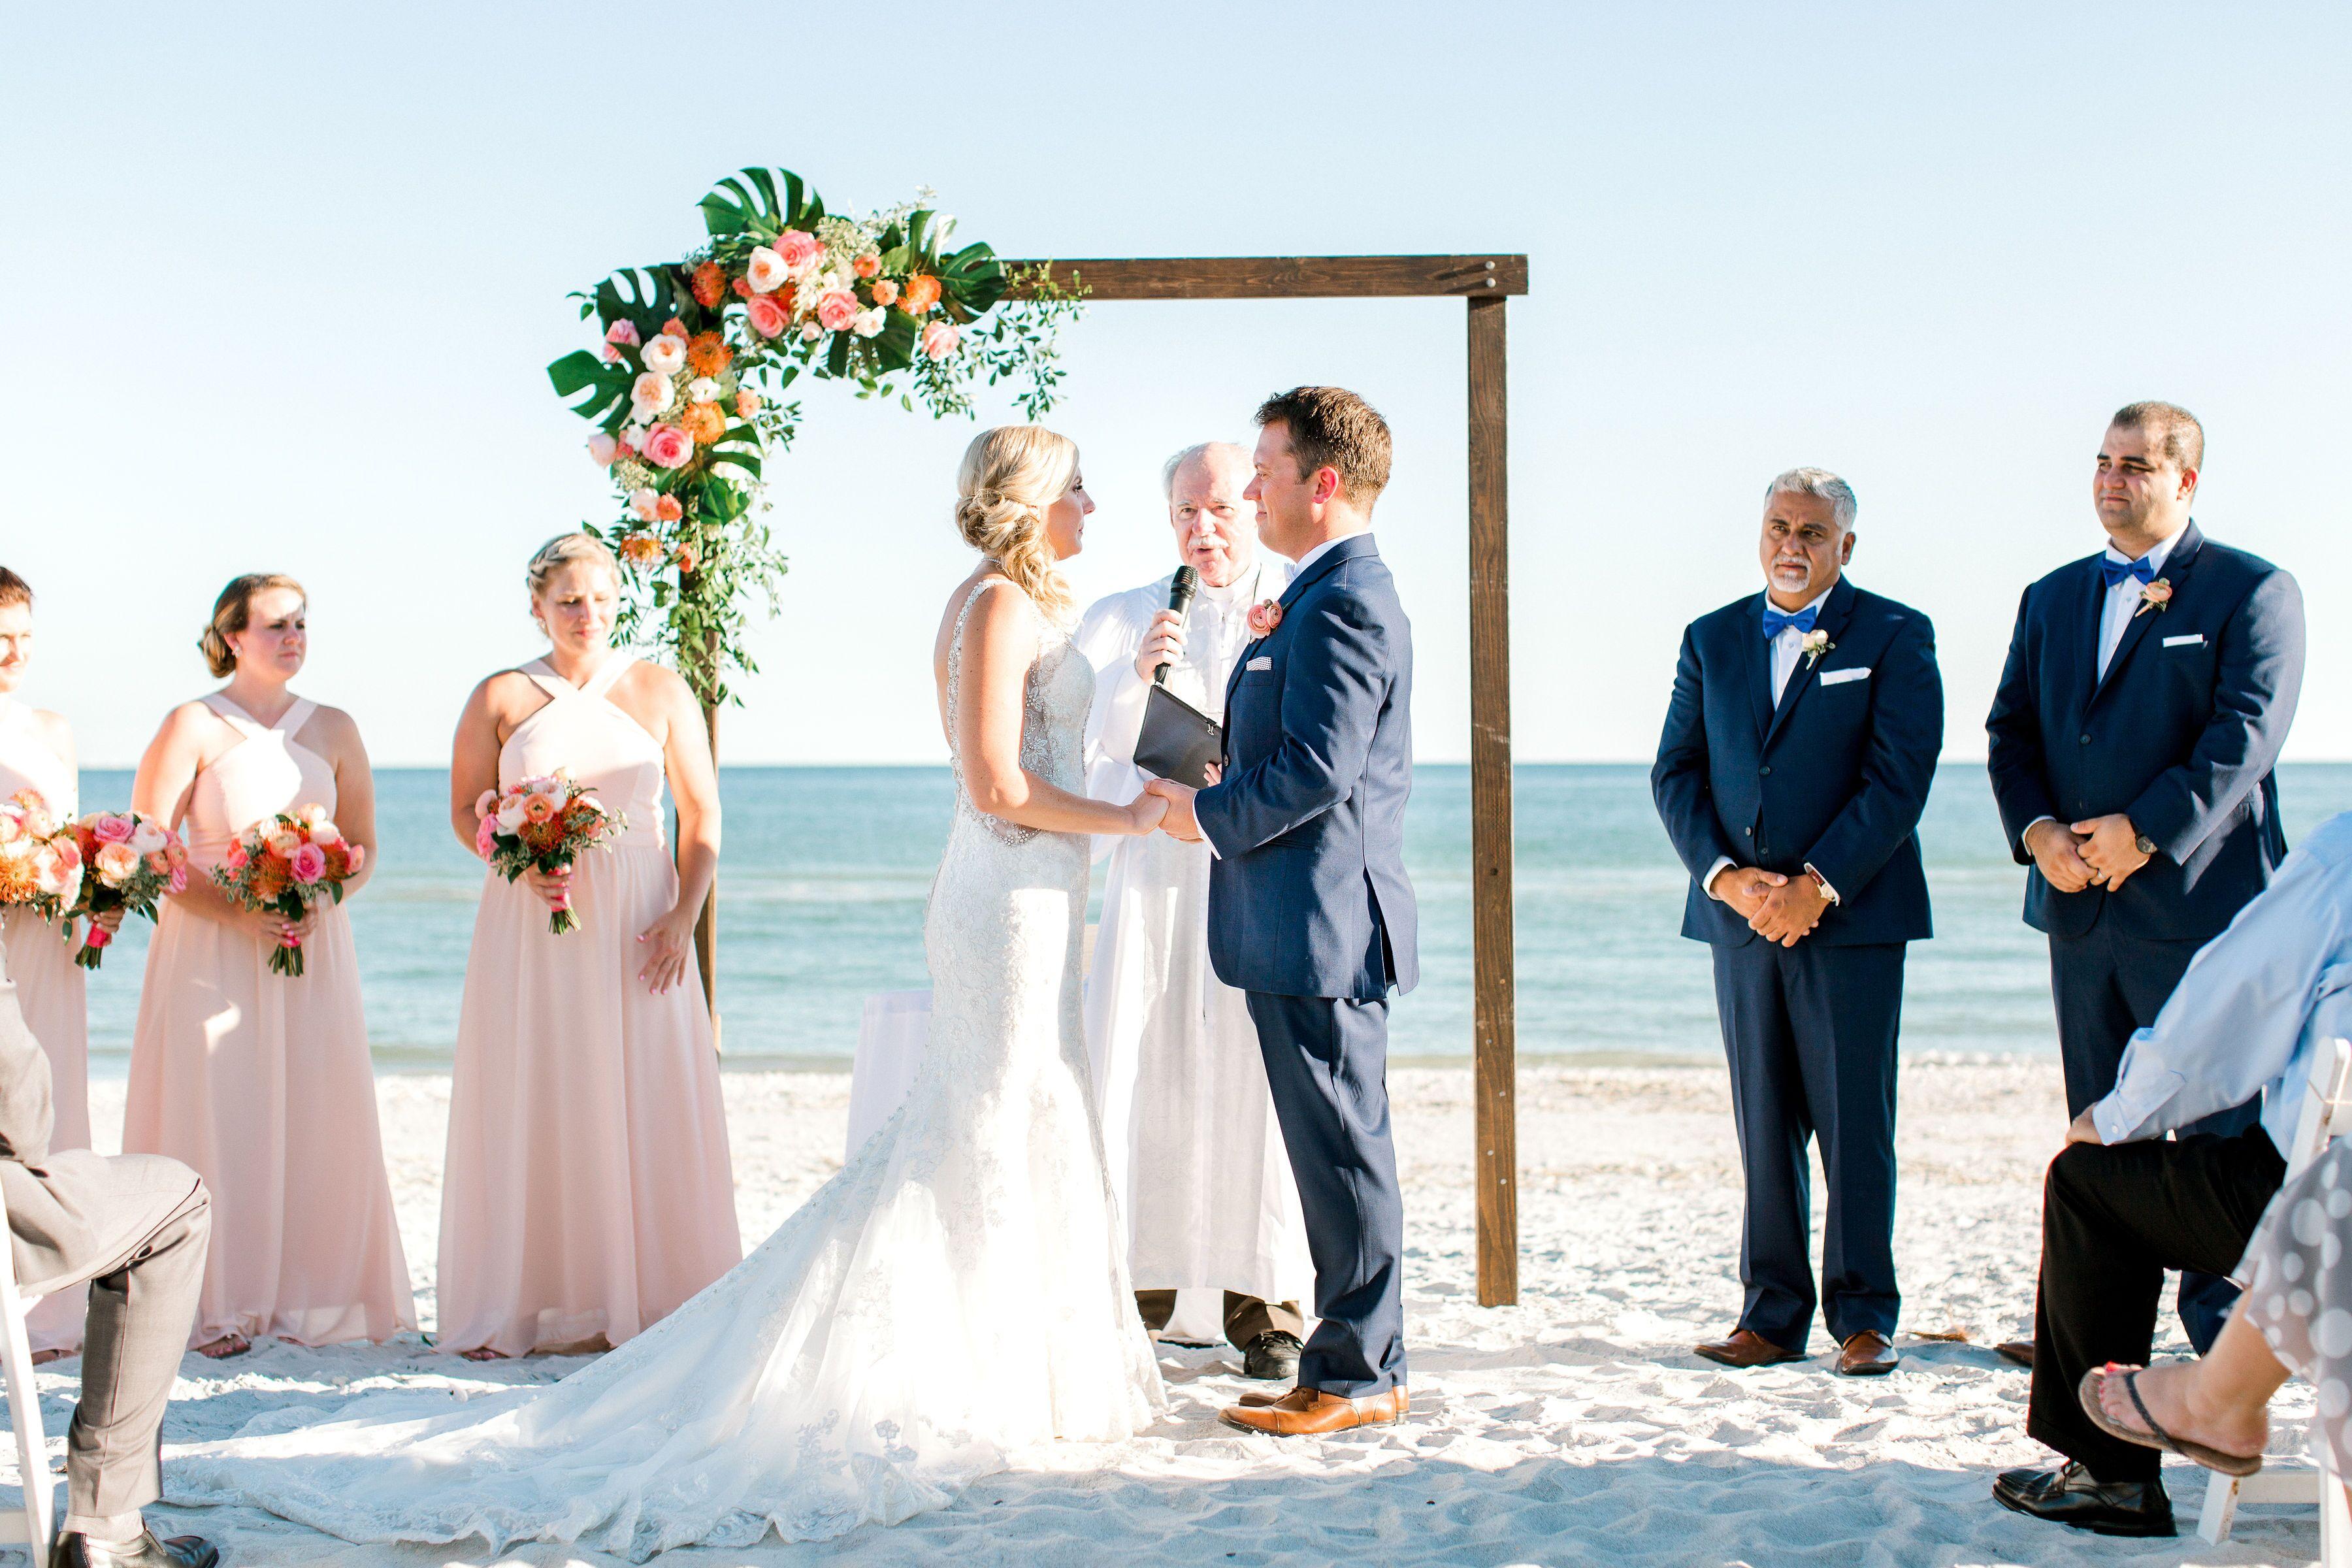 justin and ashley wedding sundial sanibel island beach elegant moments by stella